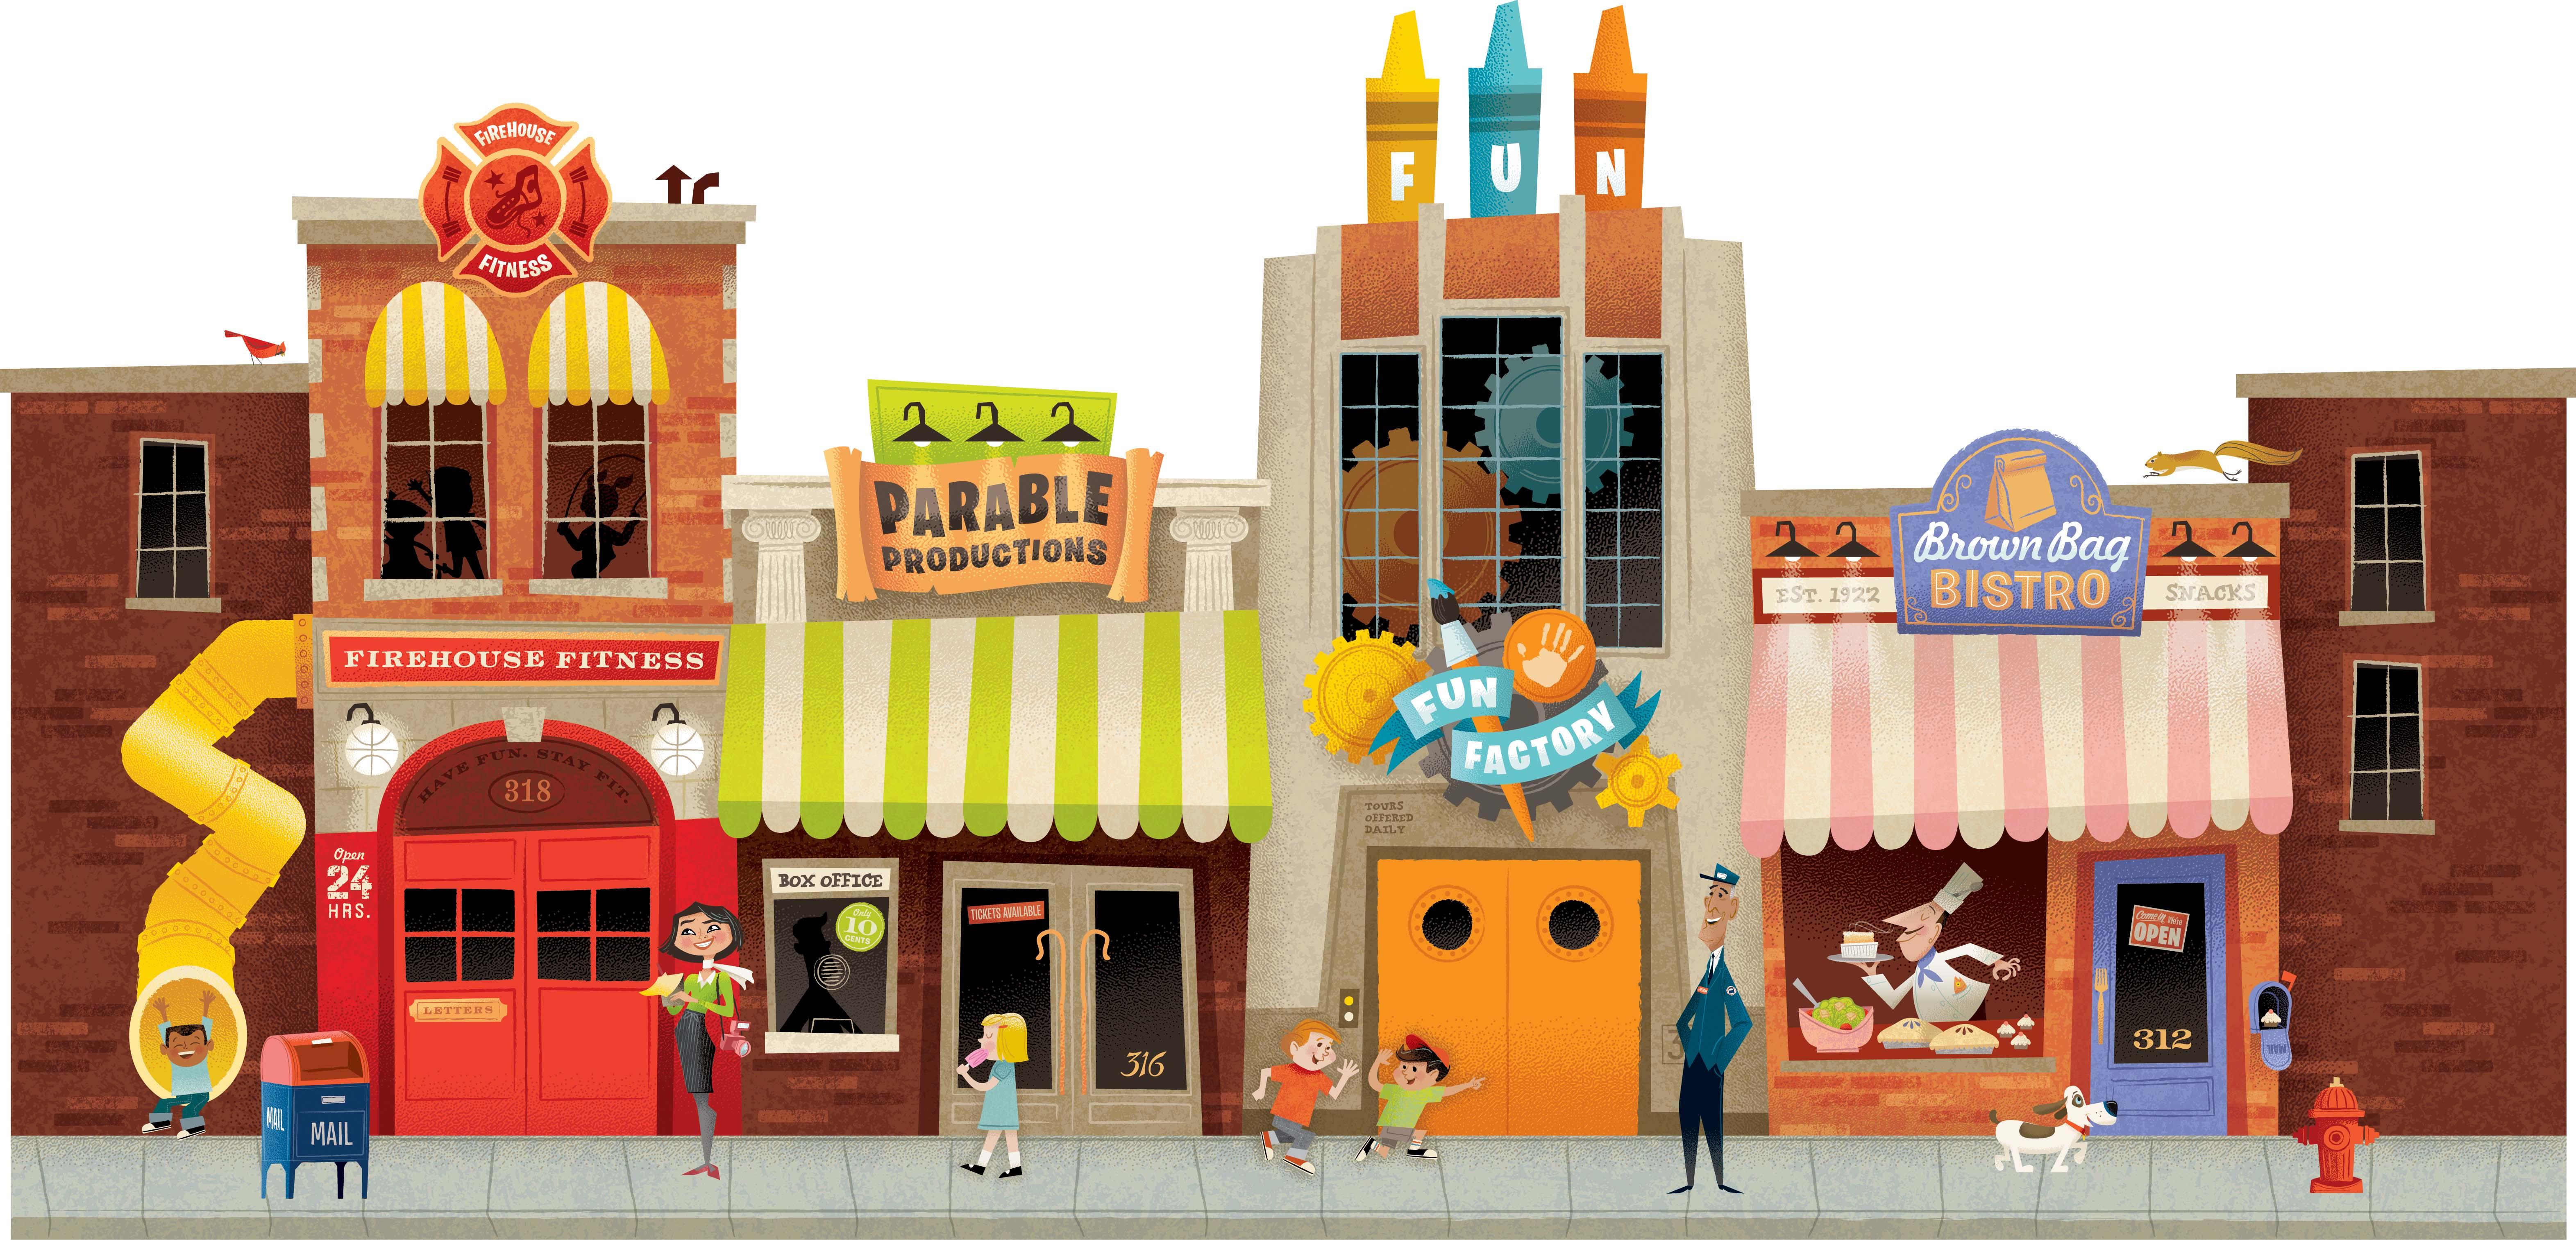 city-street-clip-art-9RkYZO-clipart.jpg